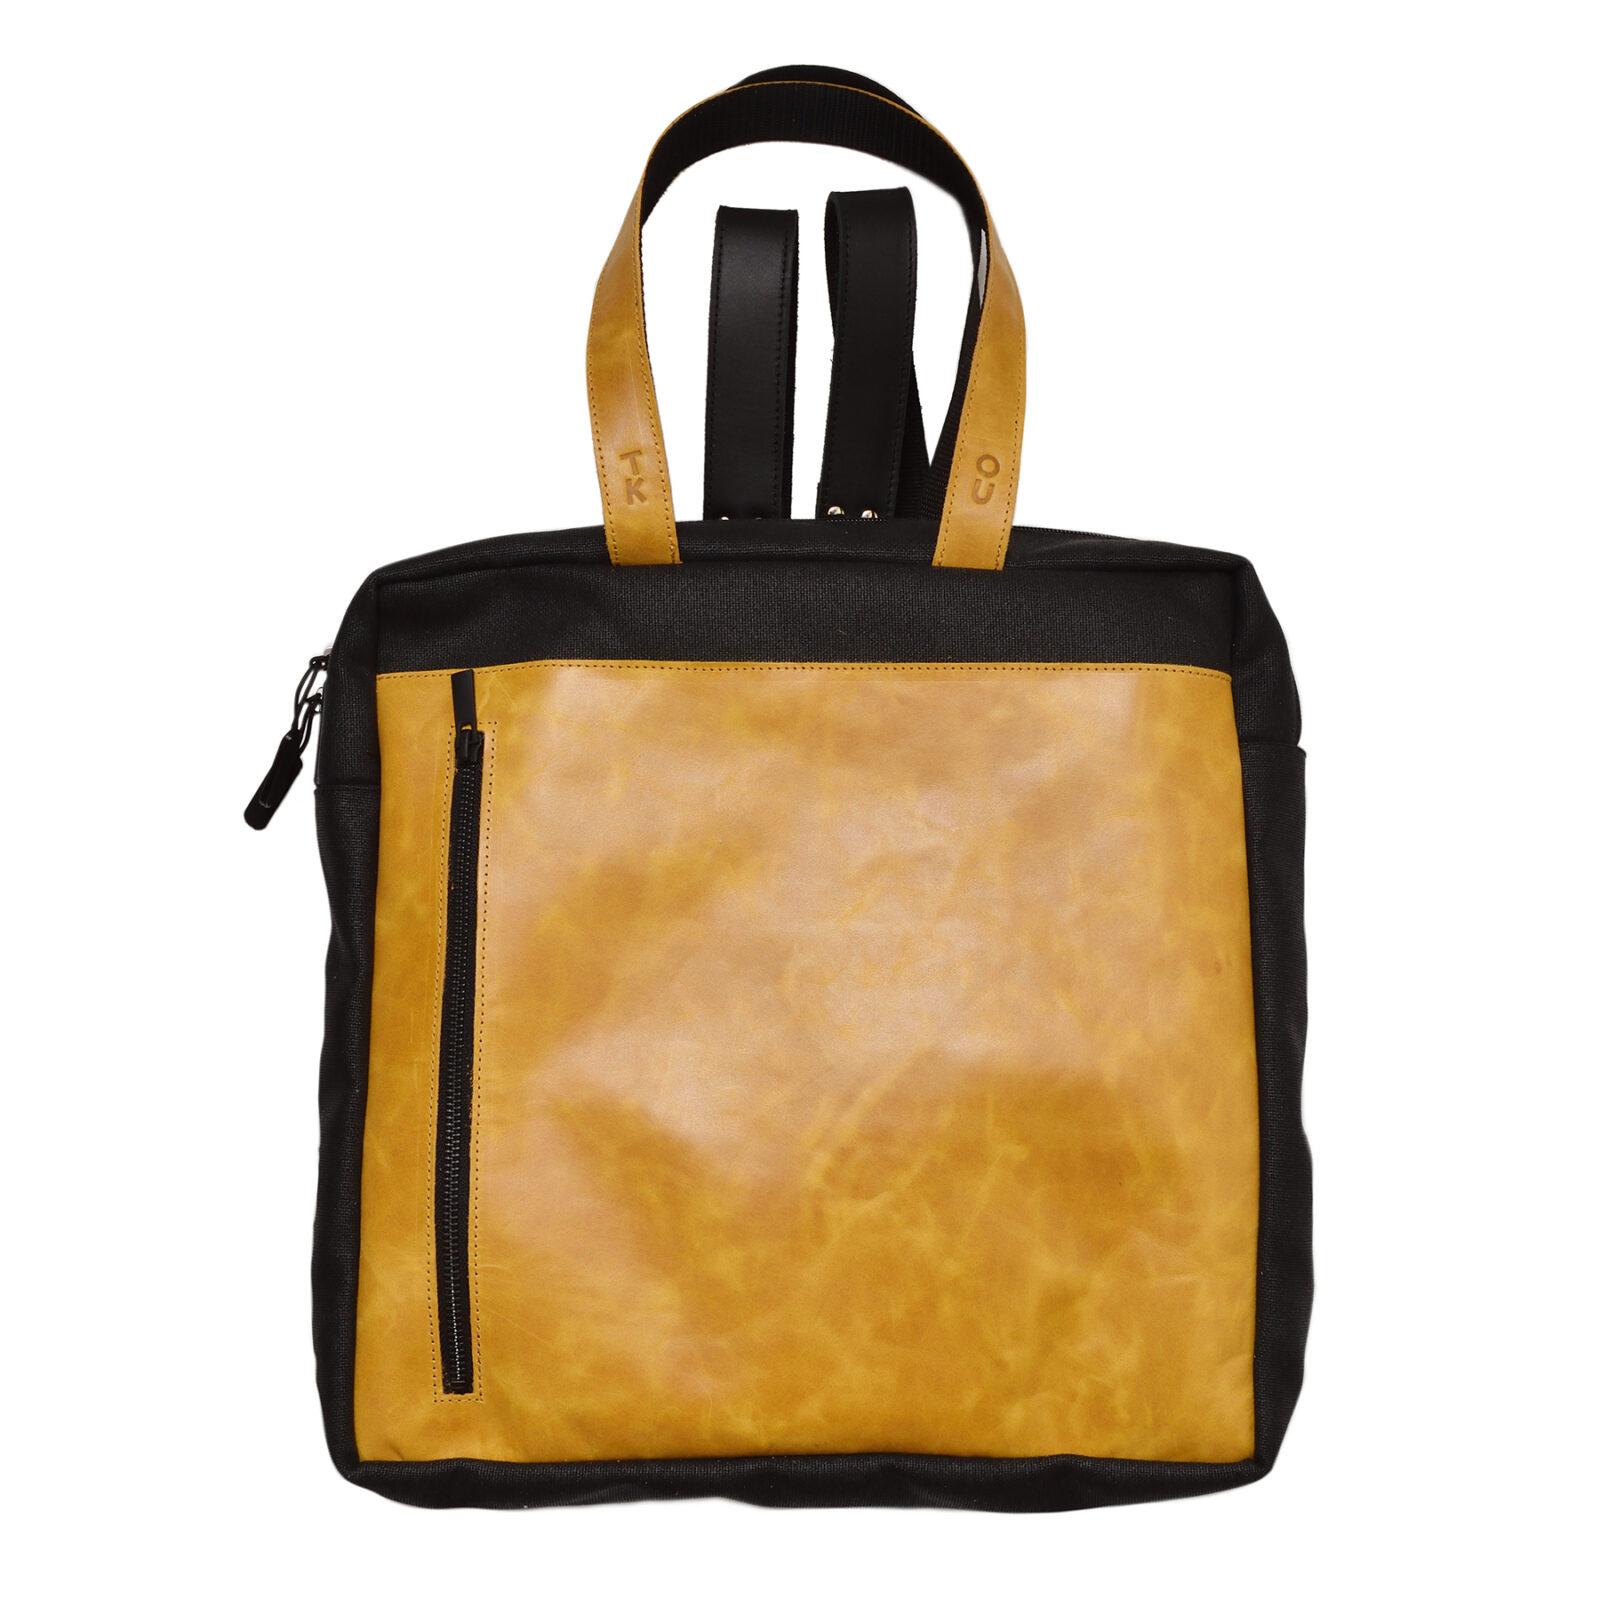 Stockholm bag yellow